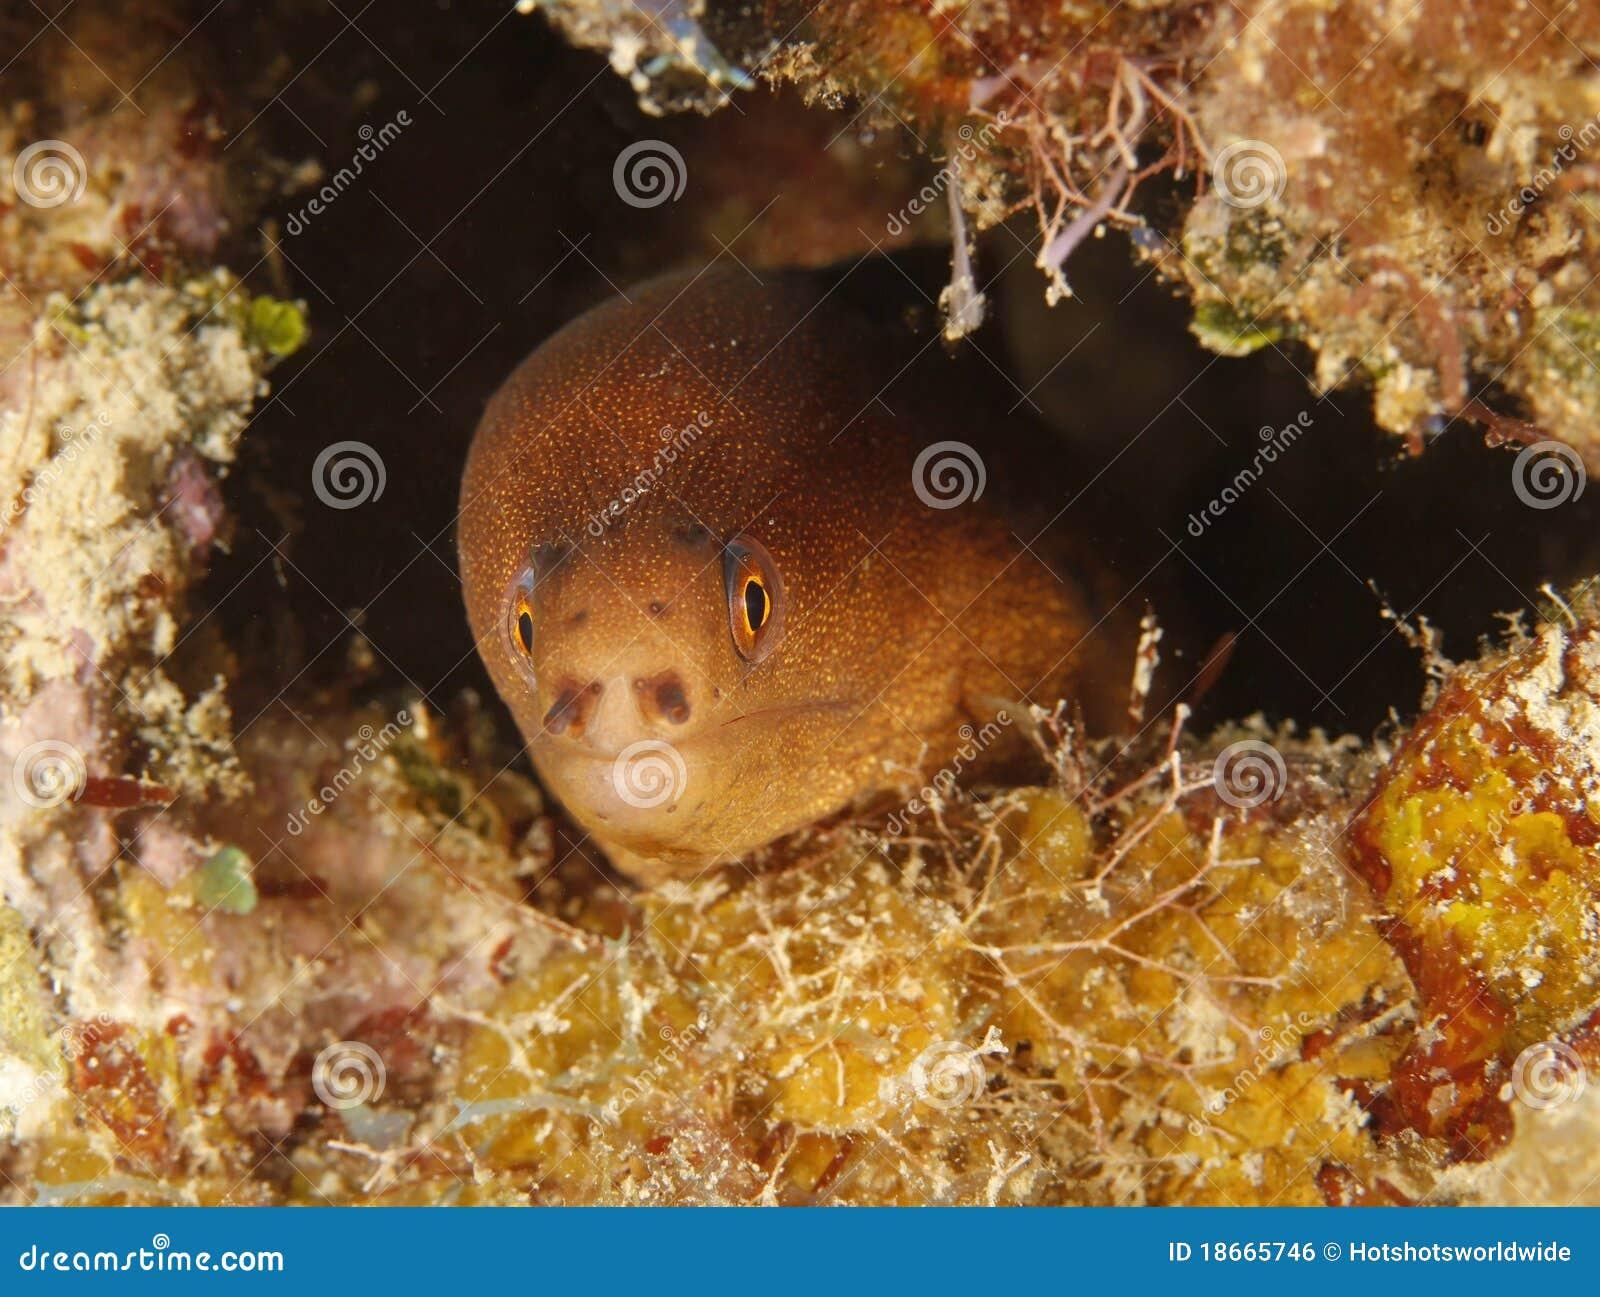 golden moray eel utila honduras underwater snake stock photo